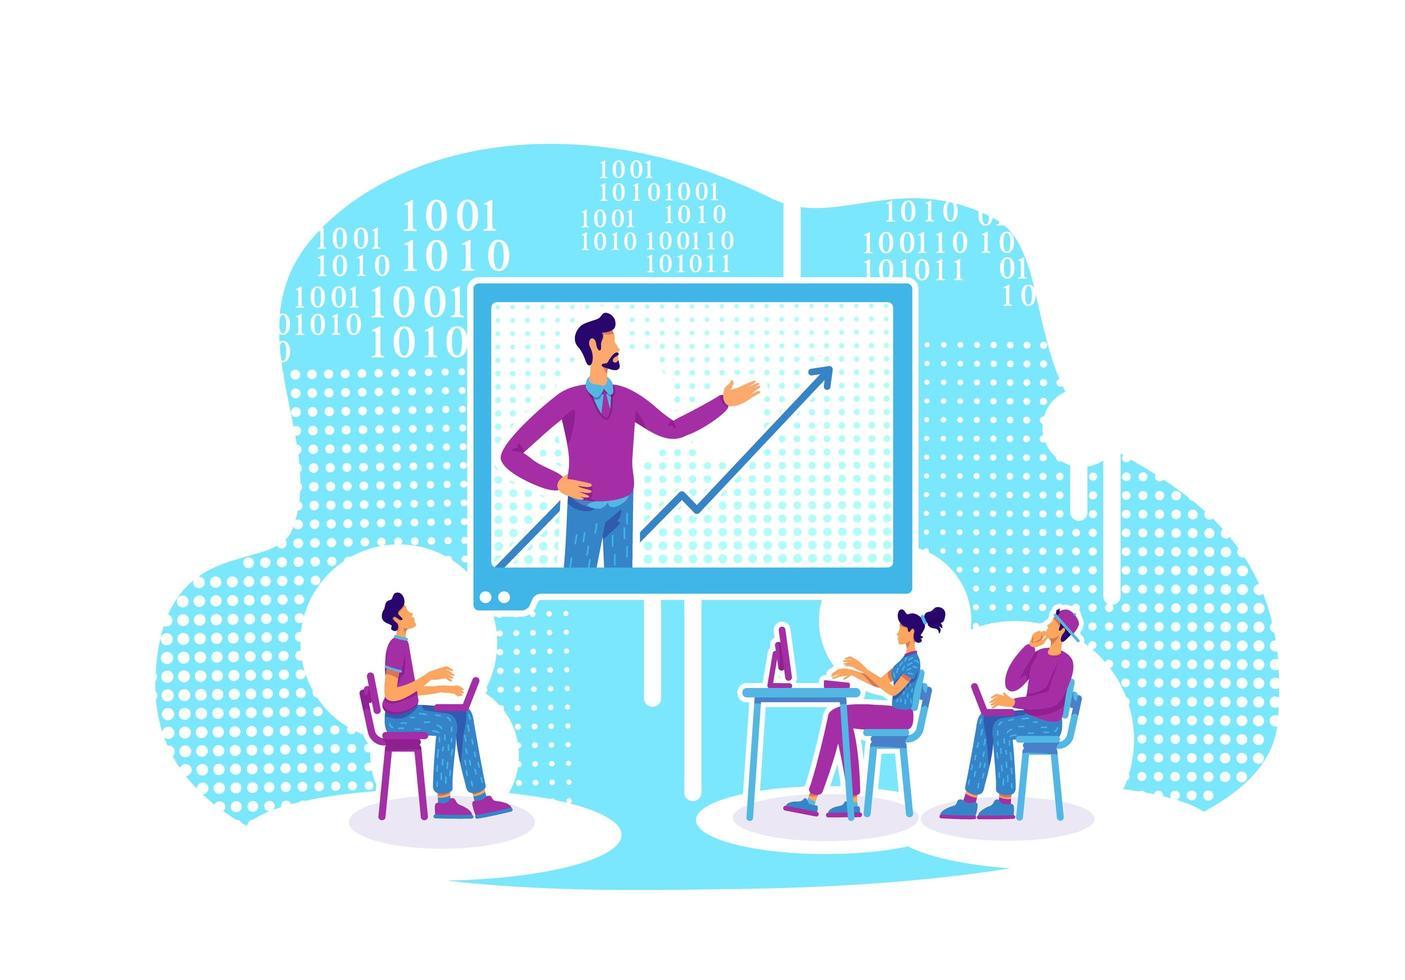 online les over gegevensanalyse en codering vector